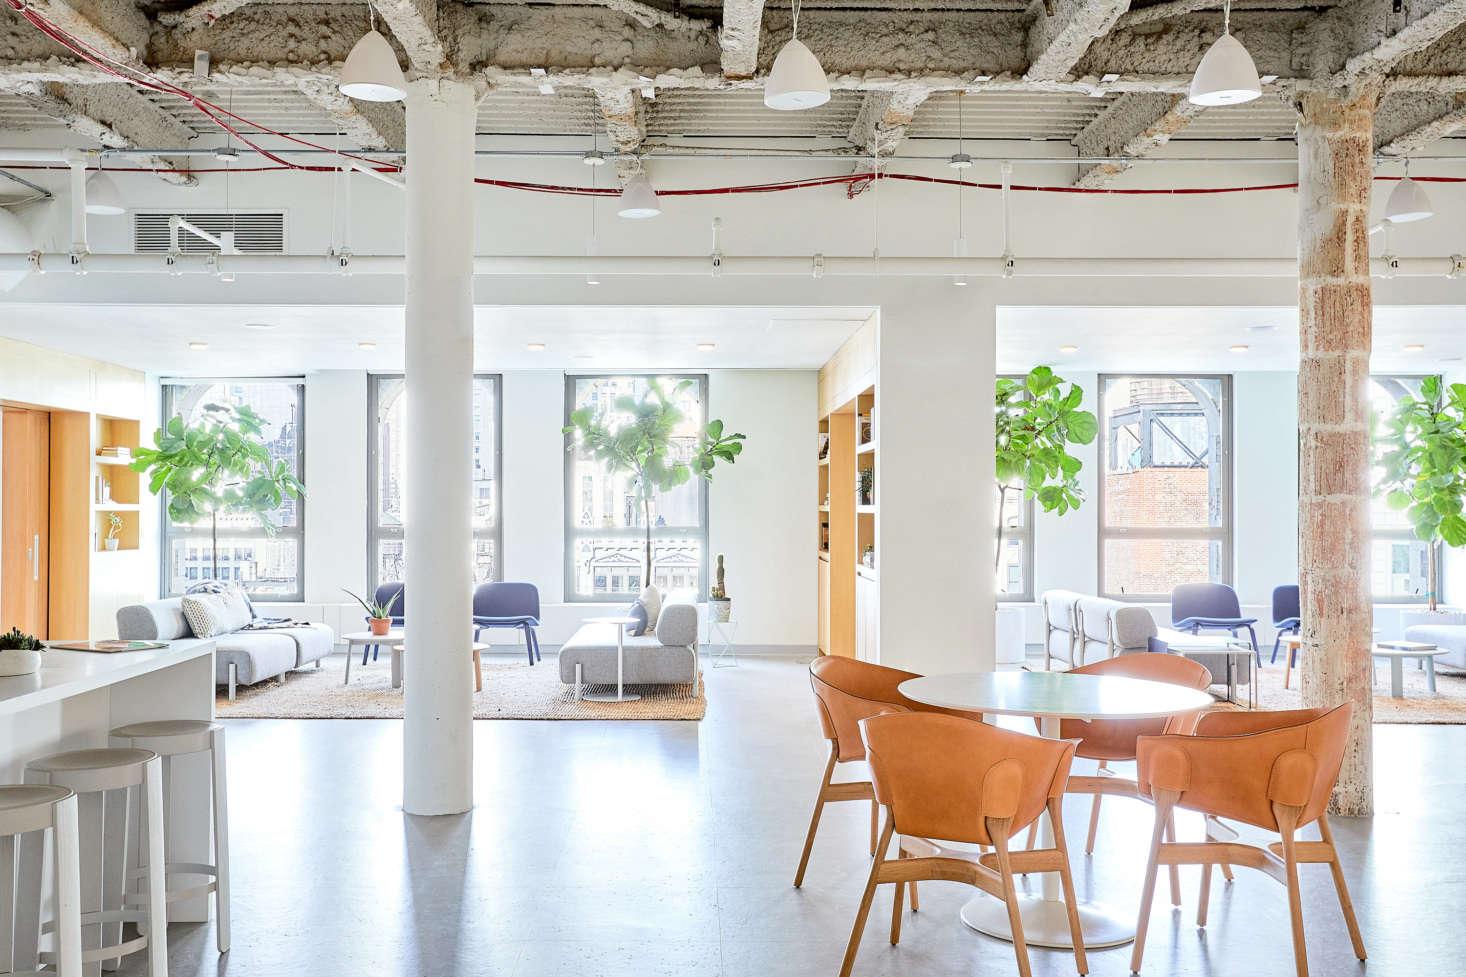 A Tour of Casper's Mod, Minimal Flatiron Headquarters